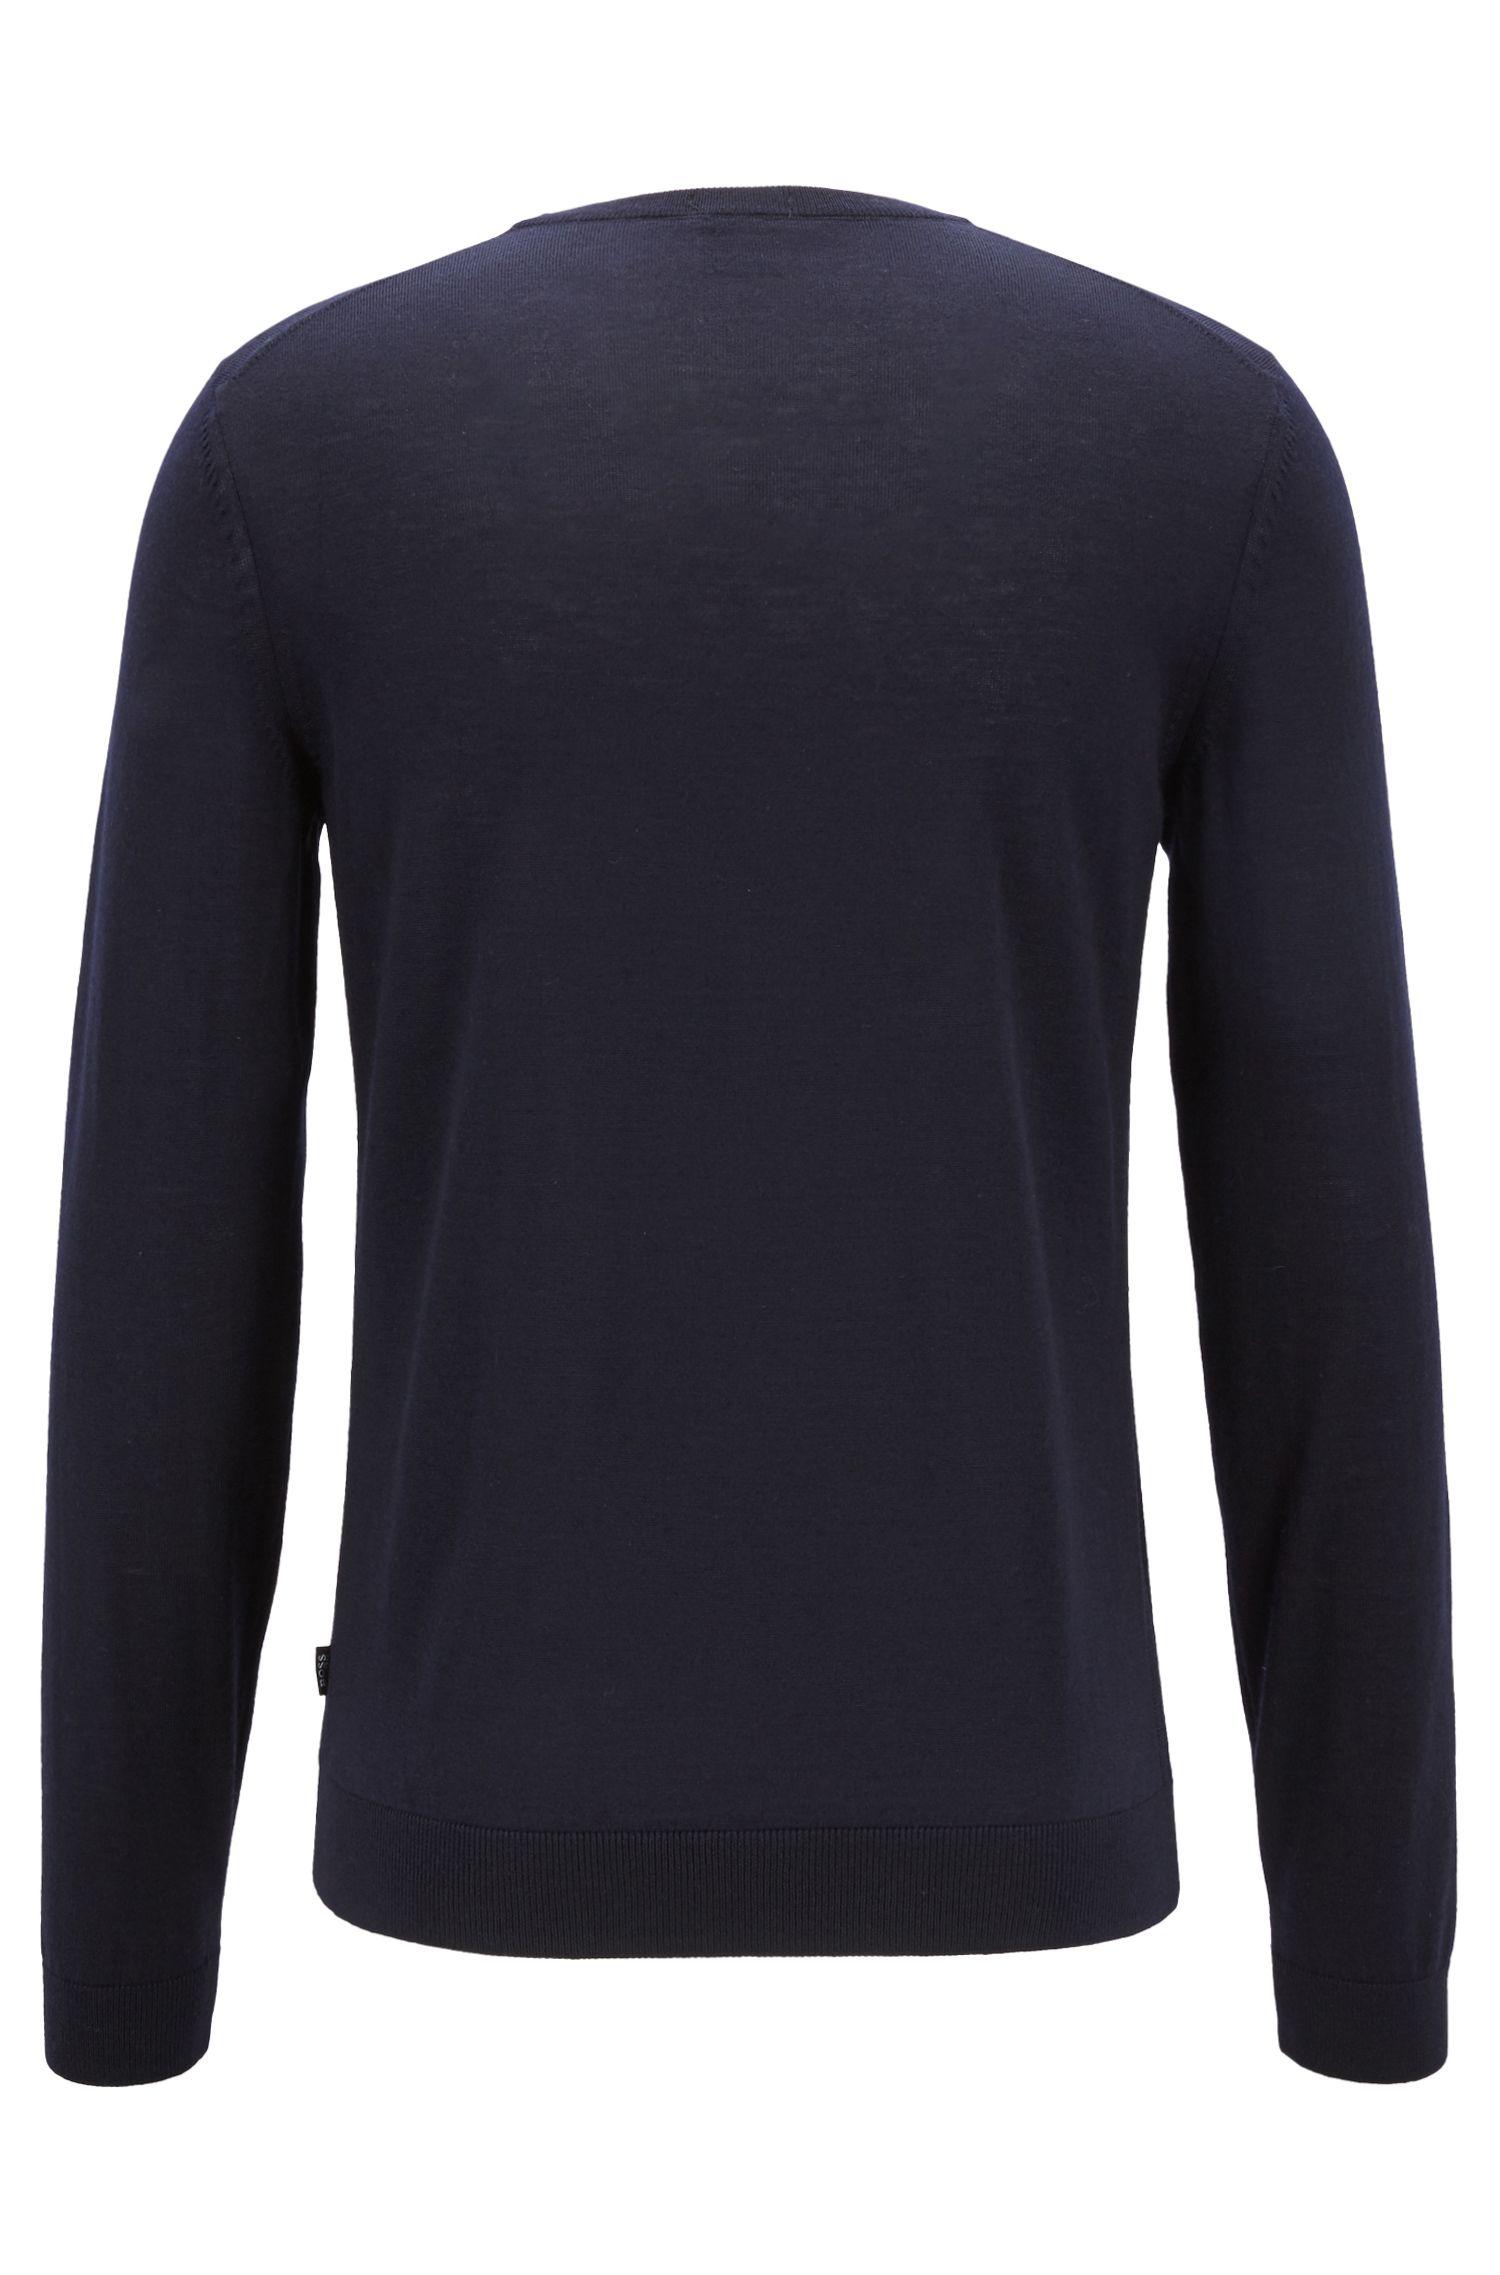 Hugo Boss - Jersey de cuello redondo en lana virgen - 5